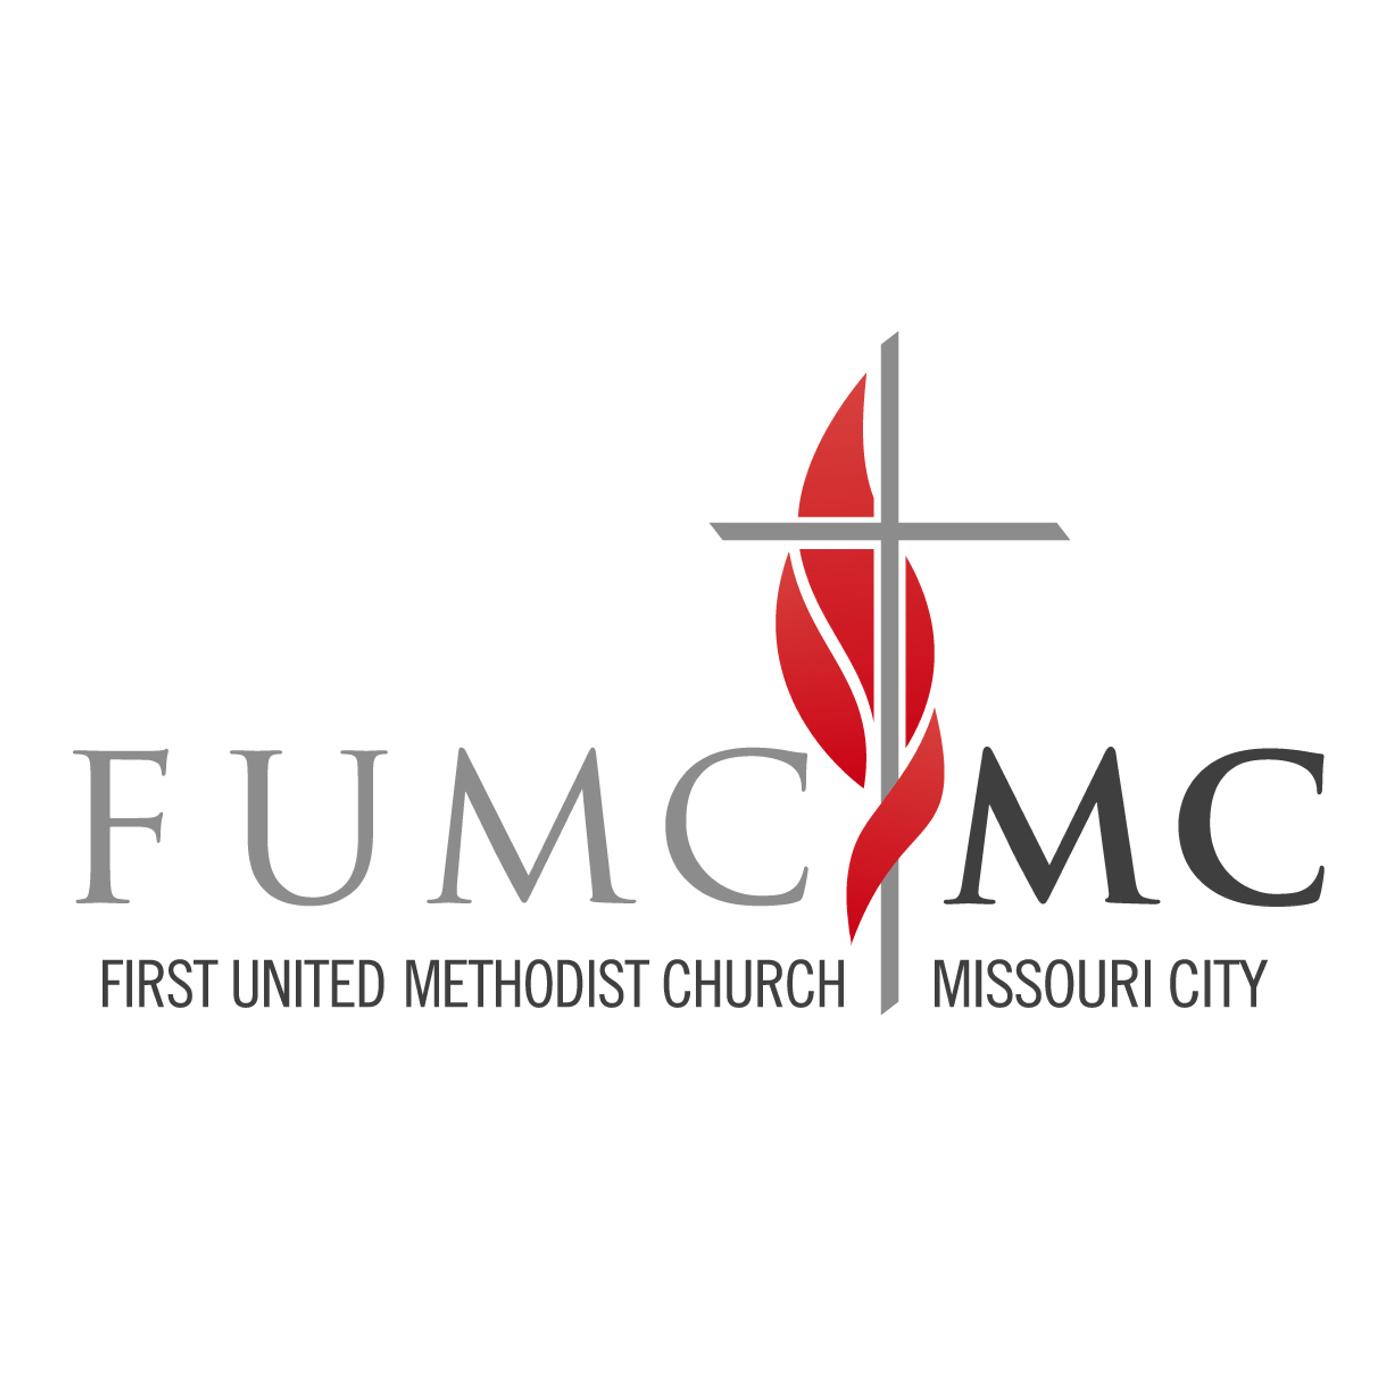 First United Methodist Church Missouri City, TX